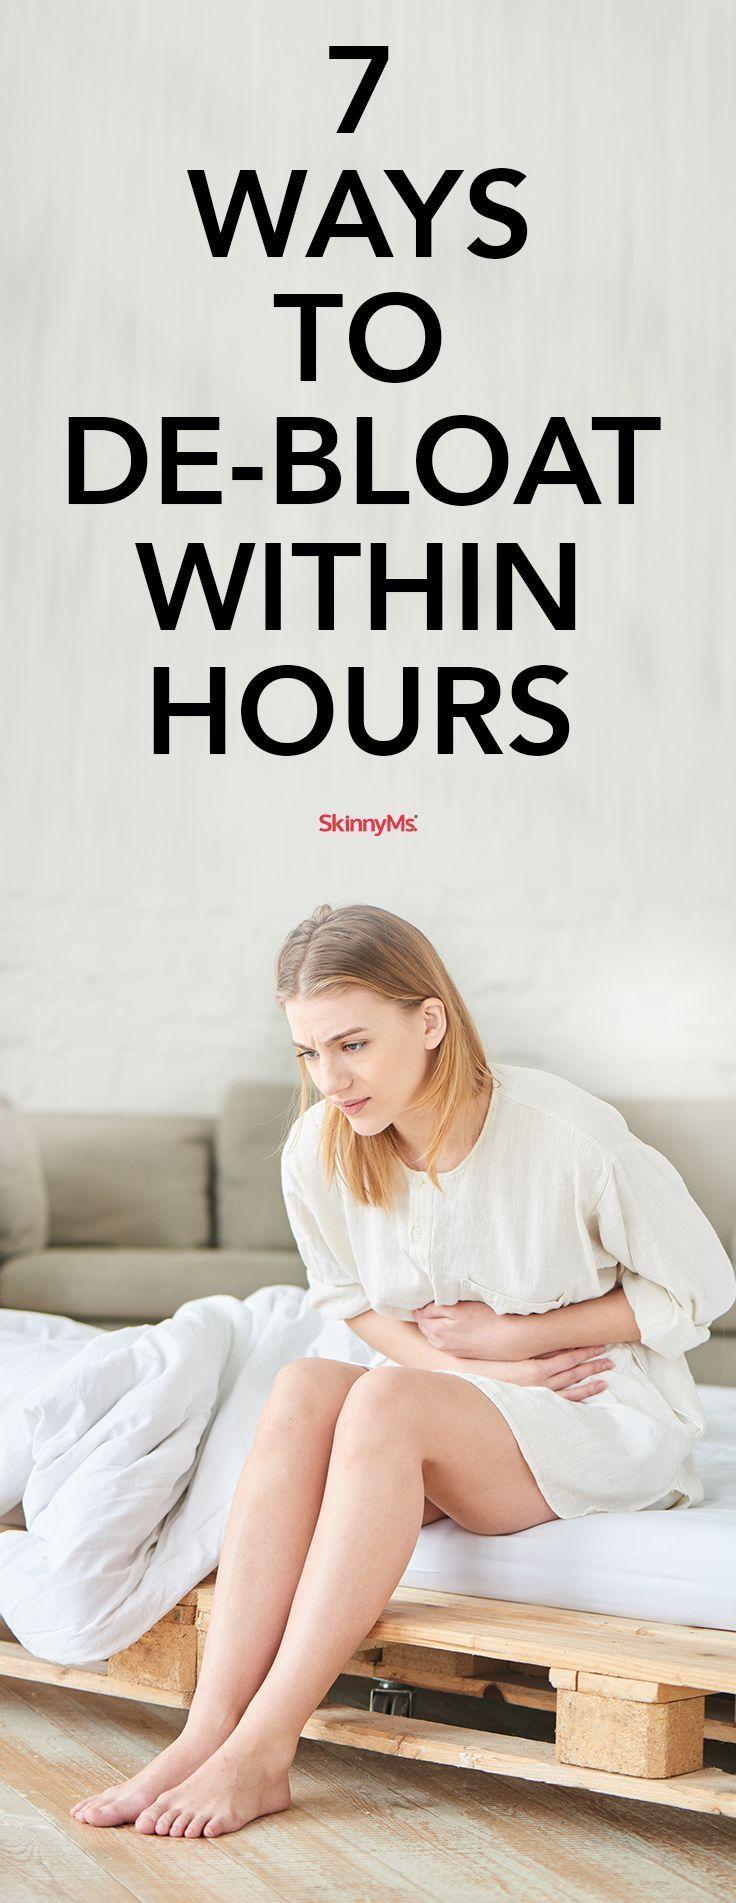 7 Ways to De-Bloat within Hours #feelbetter #skinnyms